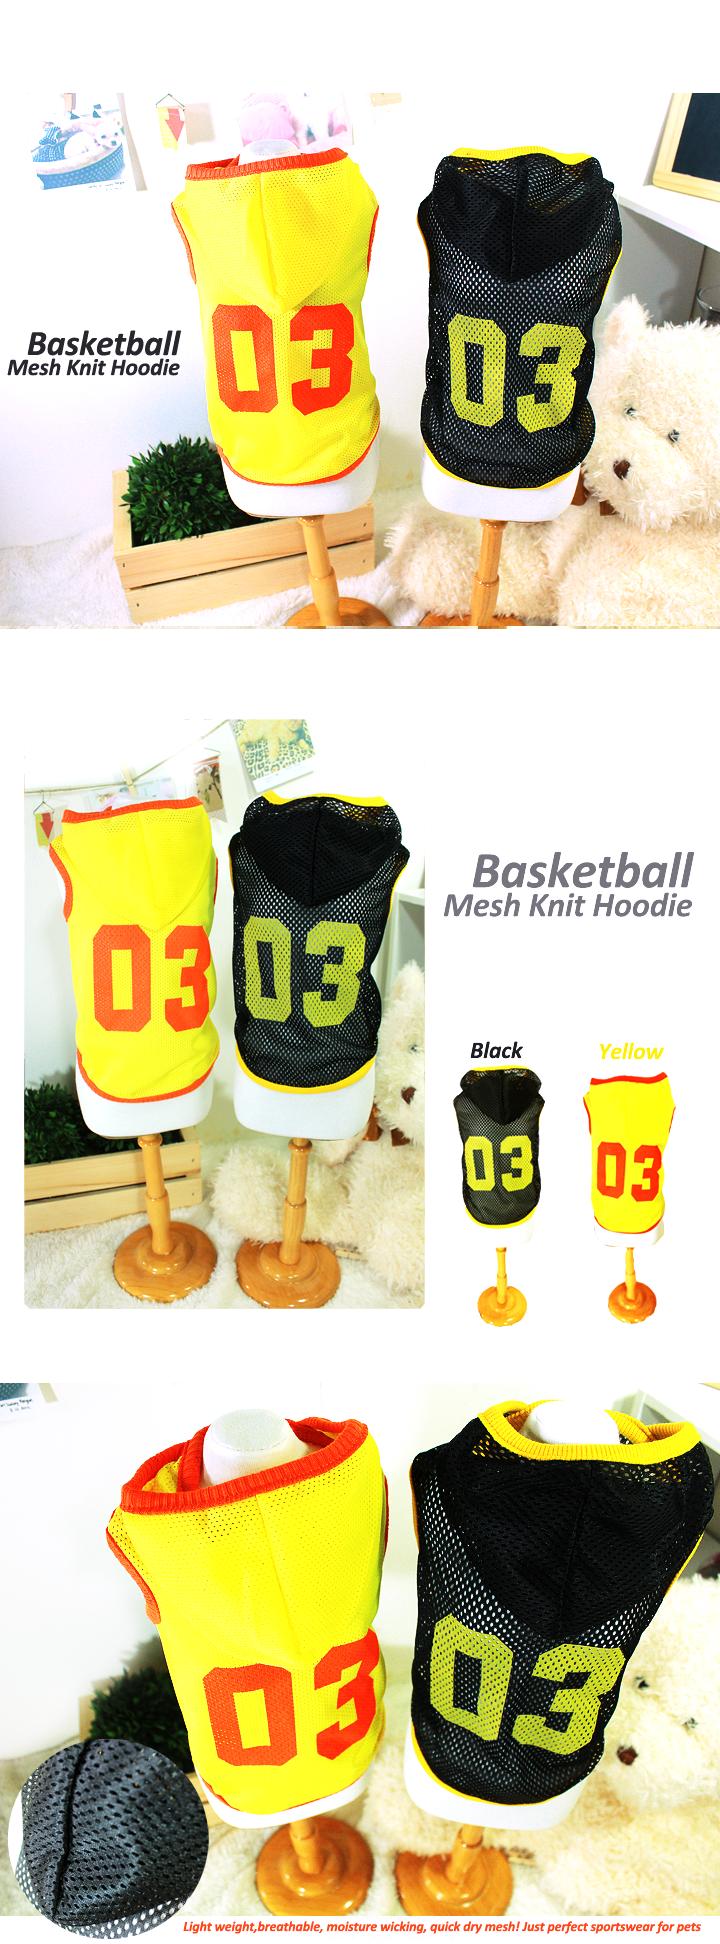 basket-ball-mesh-knit-hoodie-1.png